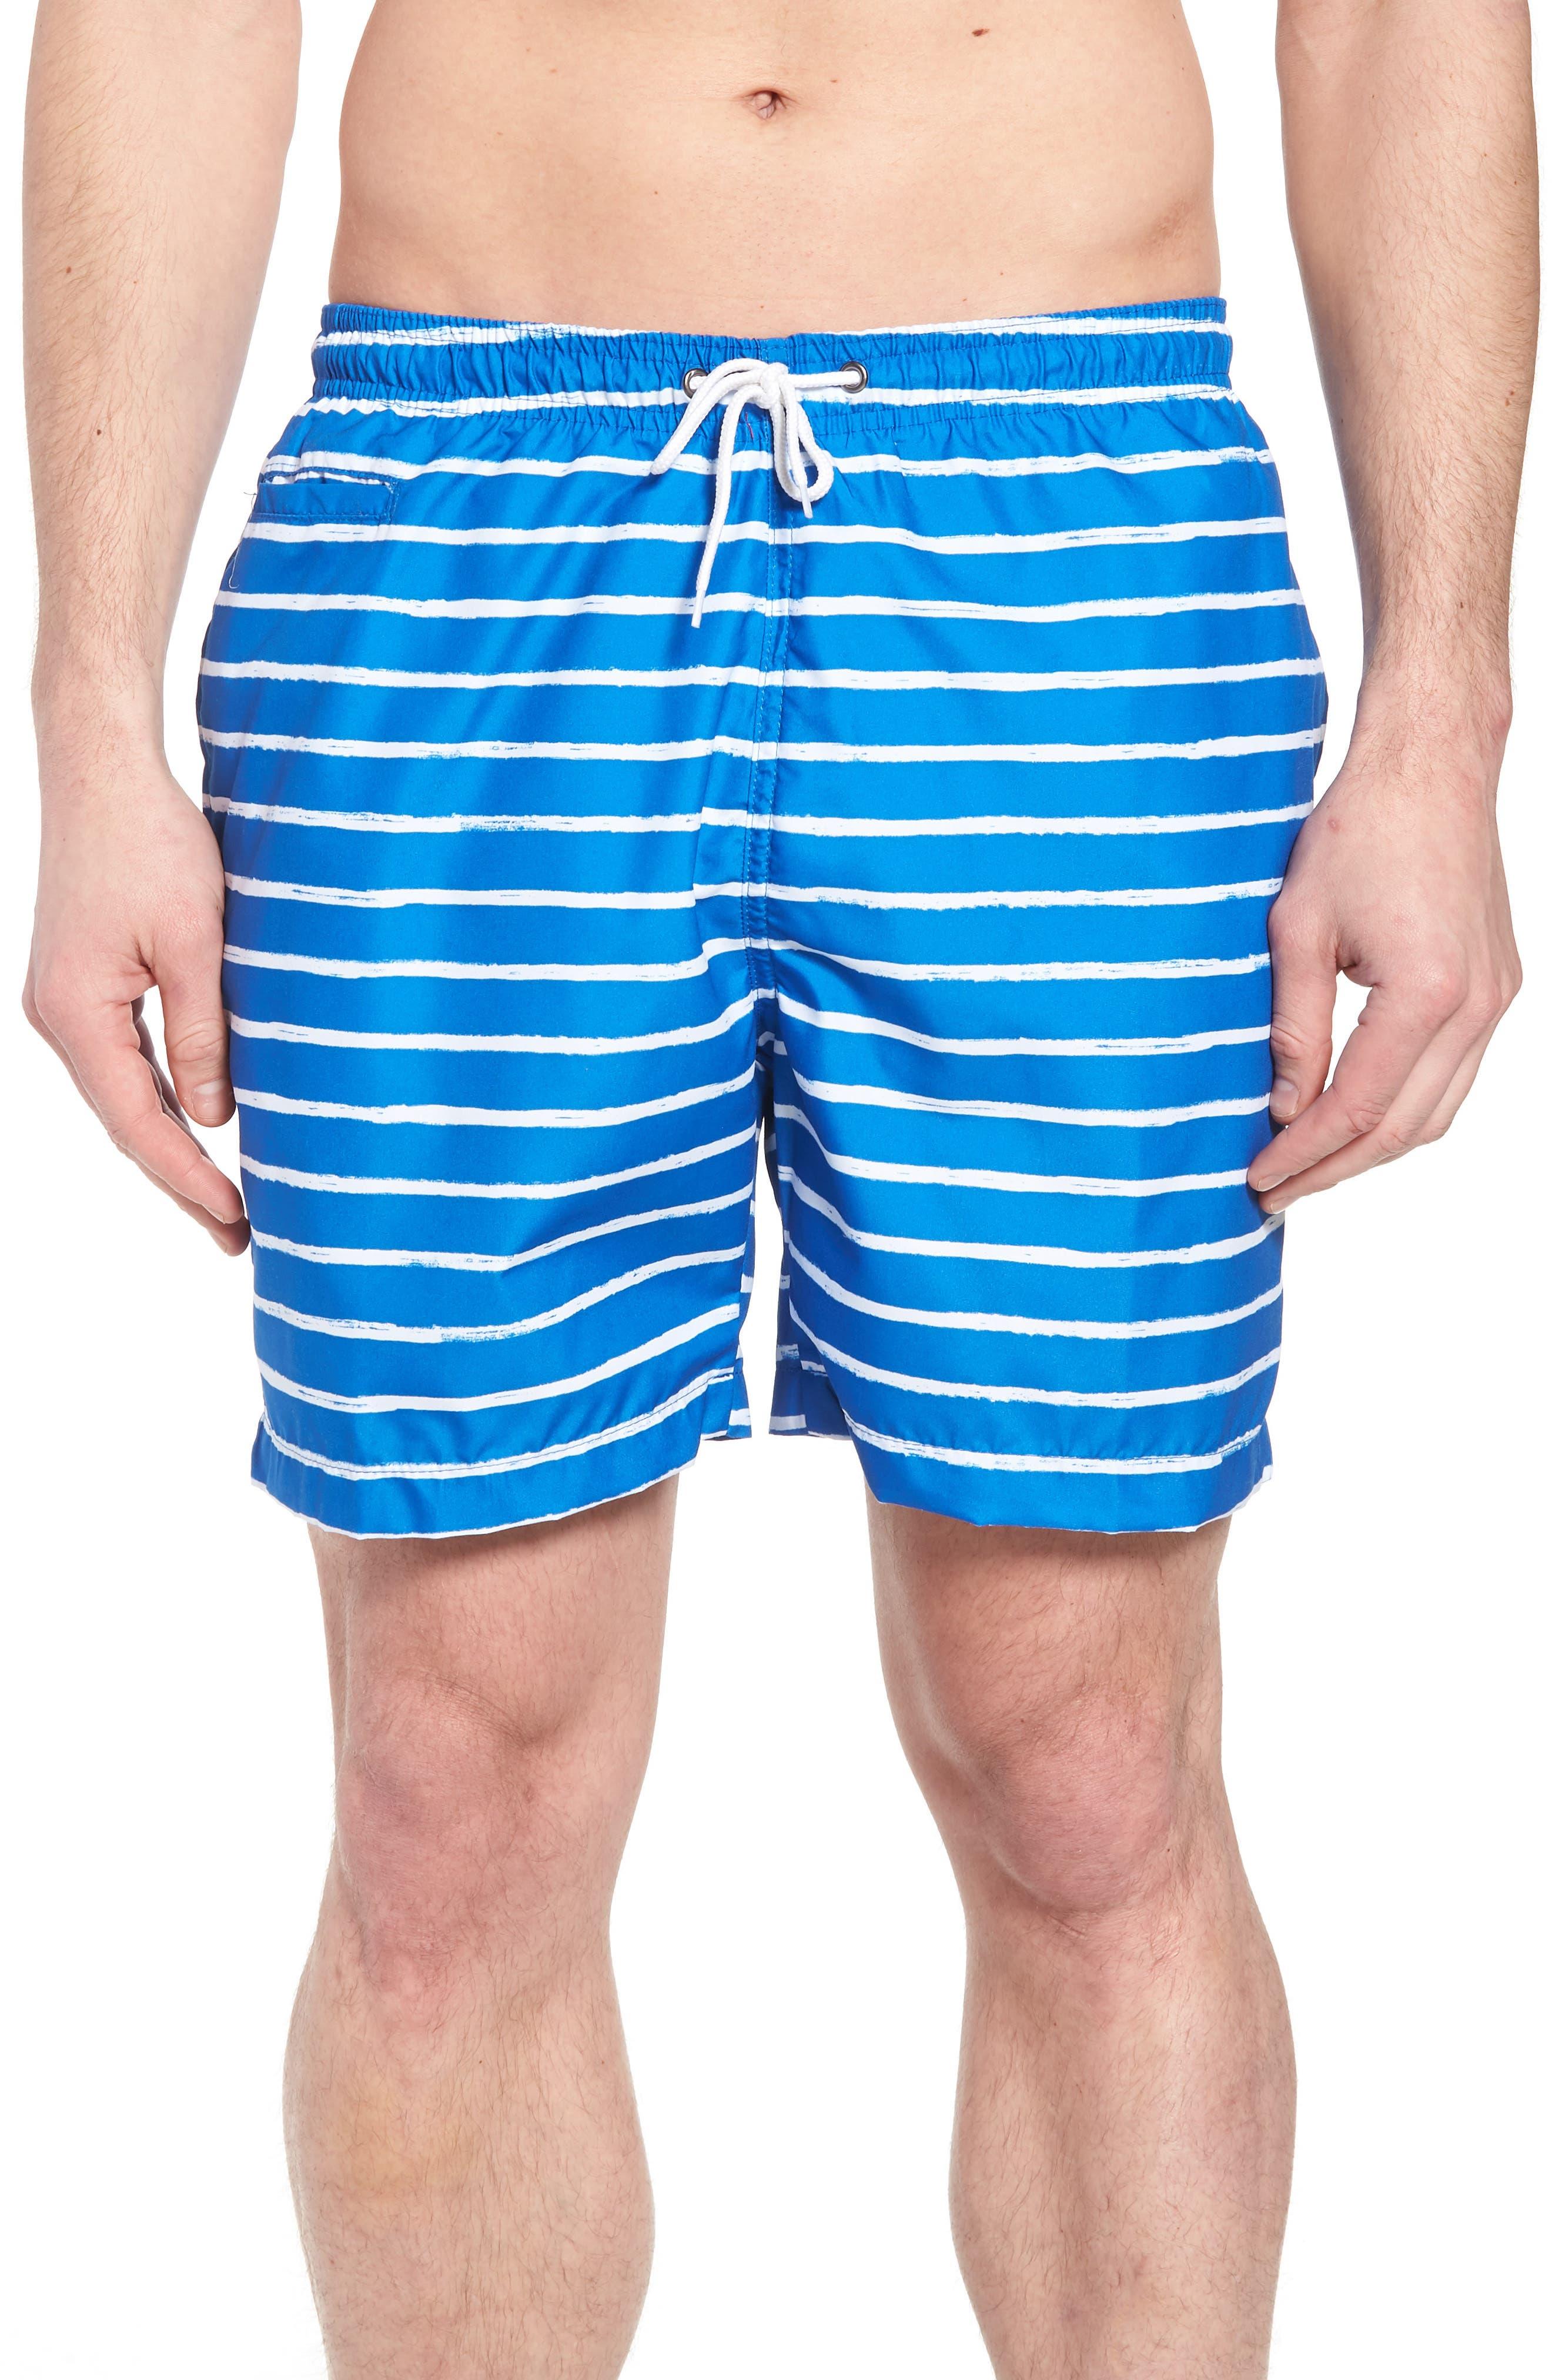 San O Stripe Swim Trunks,                         Main,                         color, 416